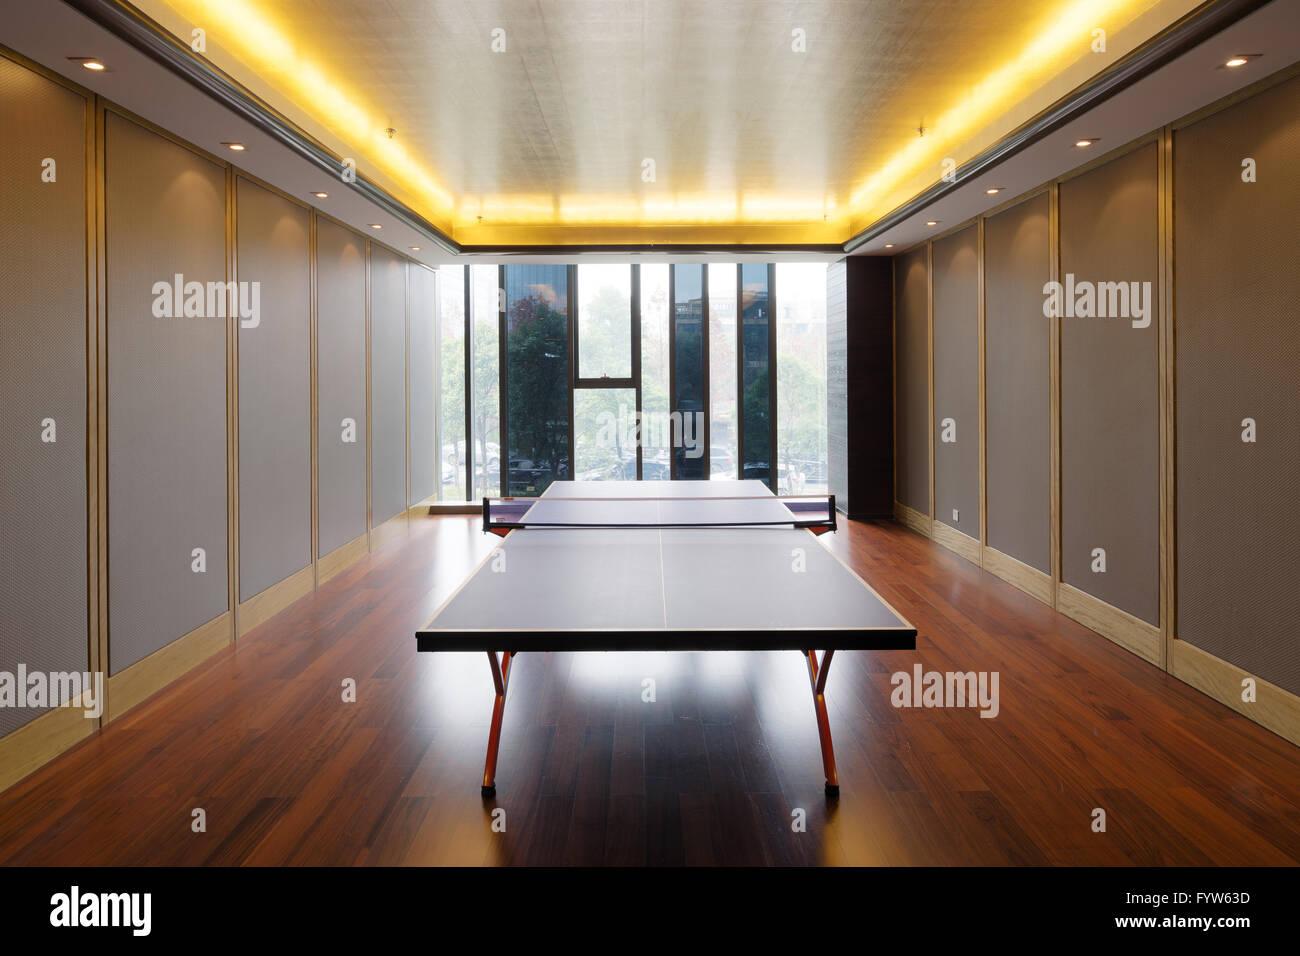 interior of table tennis room Stock Photo 103201153 Alamy